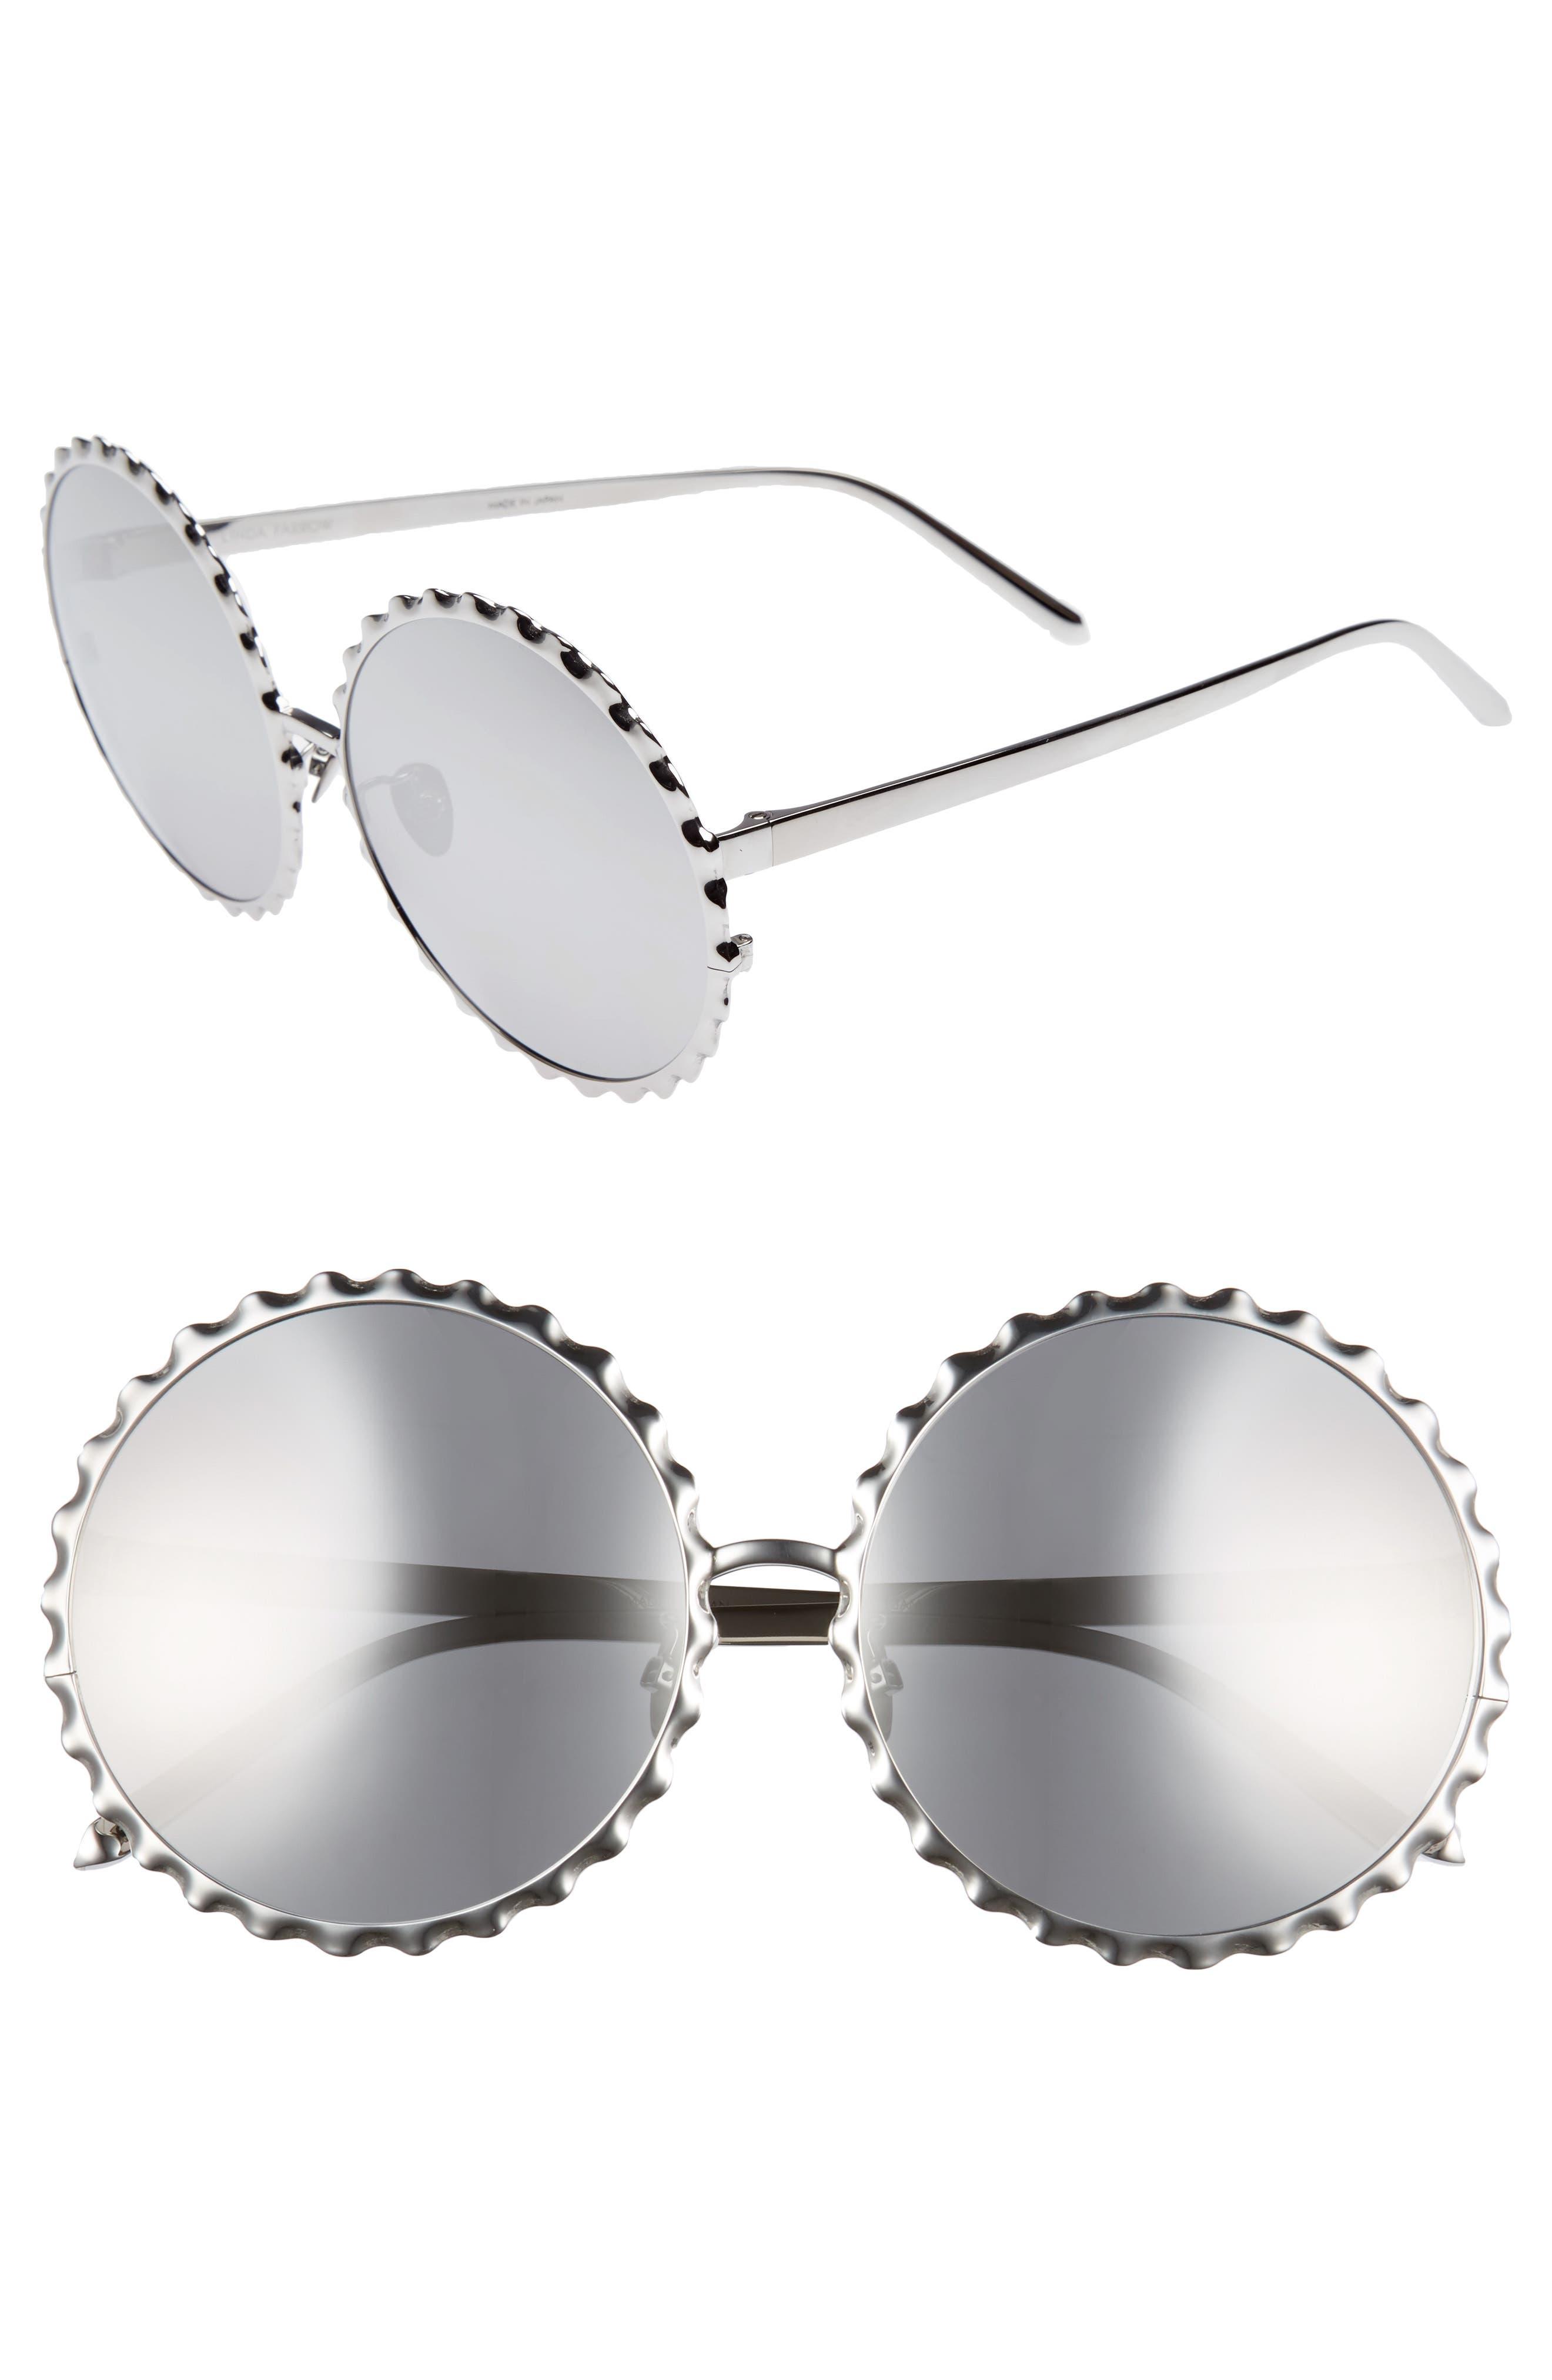 59mm Mirrored 18 Karat Gold Trim Round Sunglasses,                             Main thumbnail 1, color,                             710